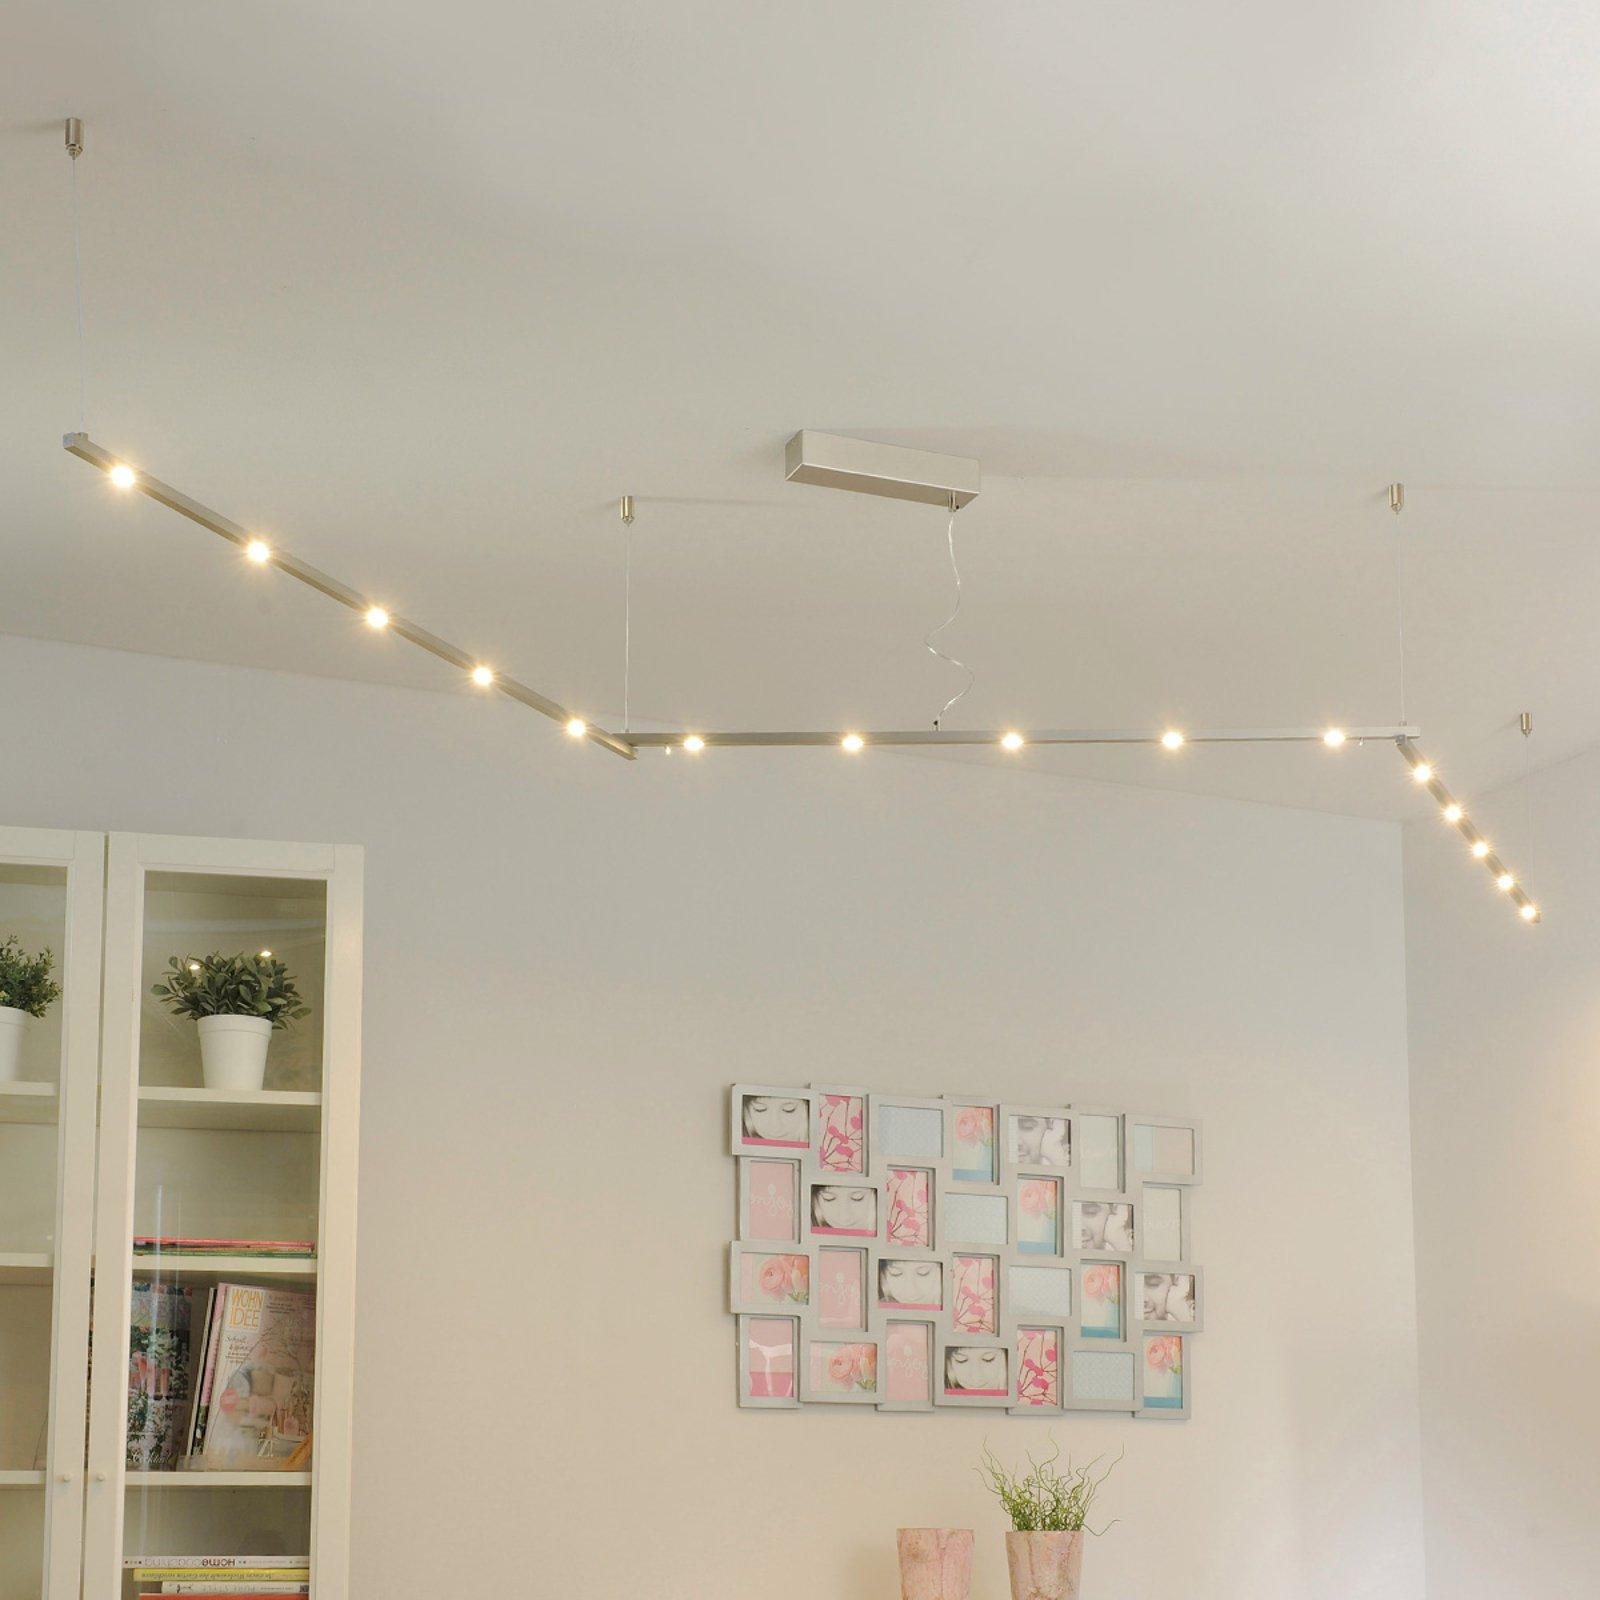 5 000 lumen - fleksibelt LED-taksystem Elta